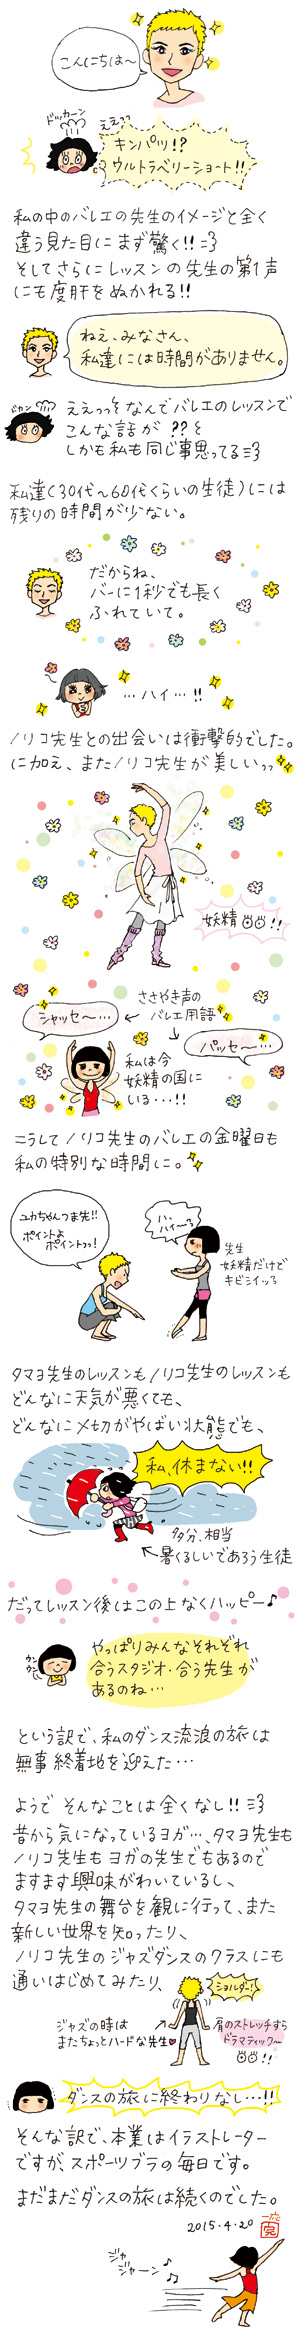 yuka6a_5.jpg